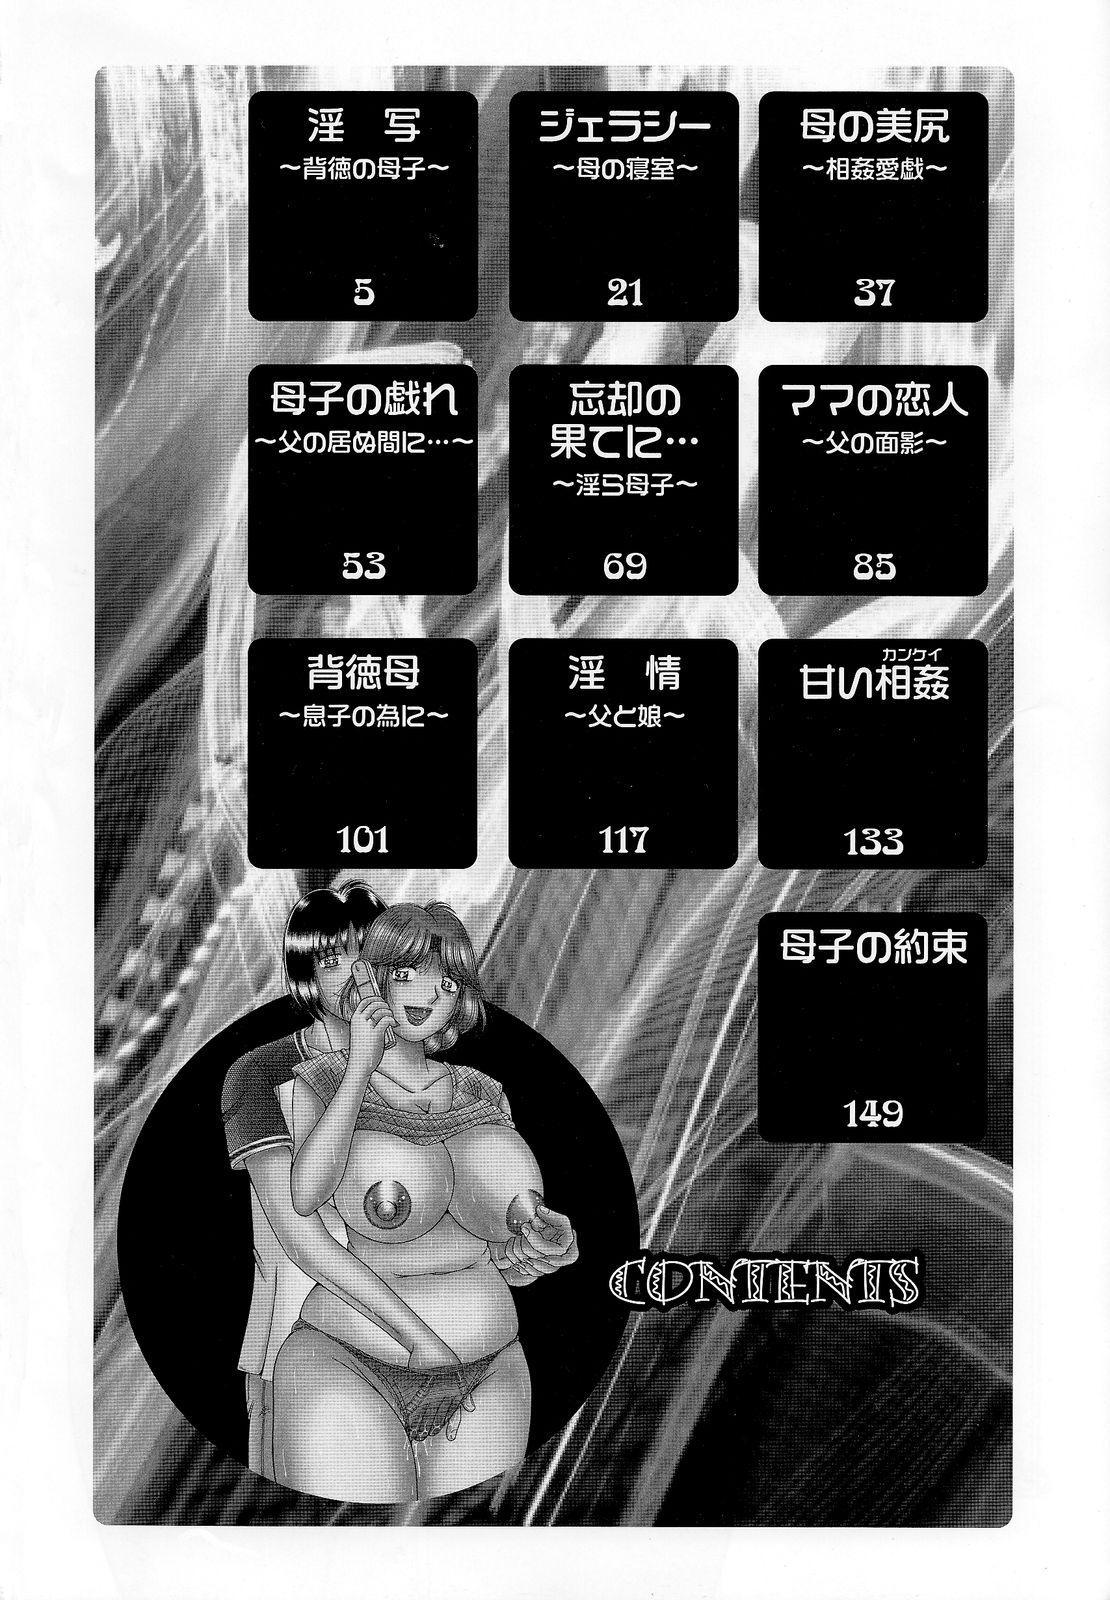 Jukubo Yuugi - Itoshii Hito Chapter 1 + 2 + 3 5